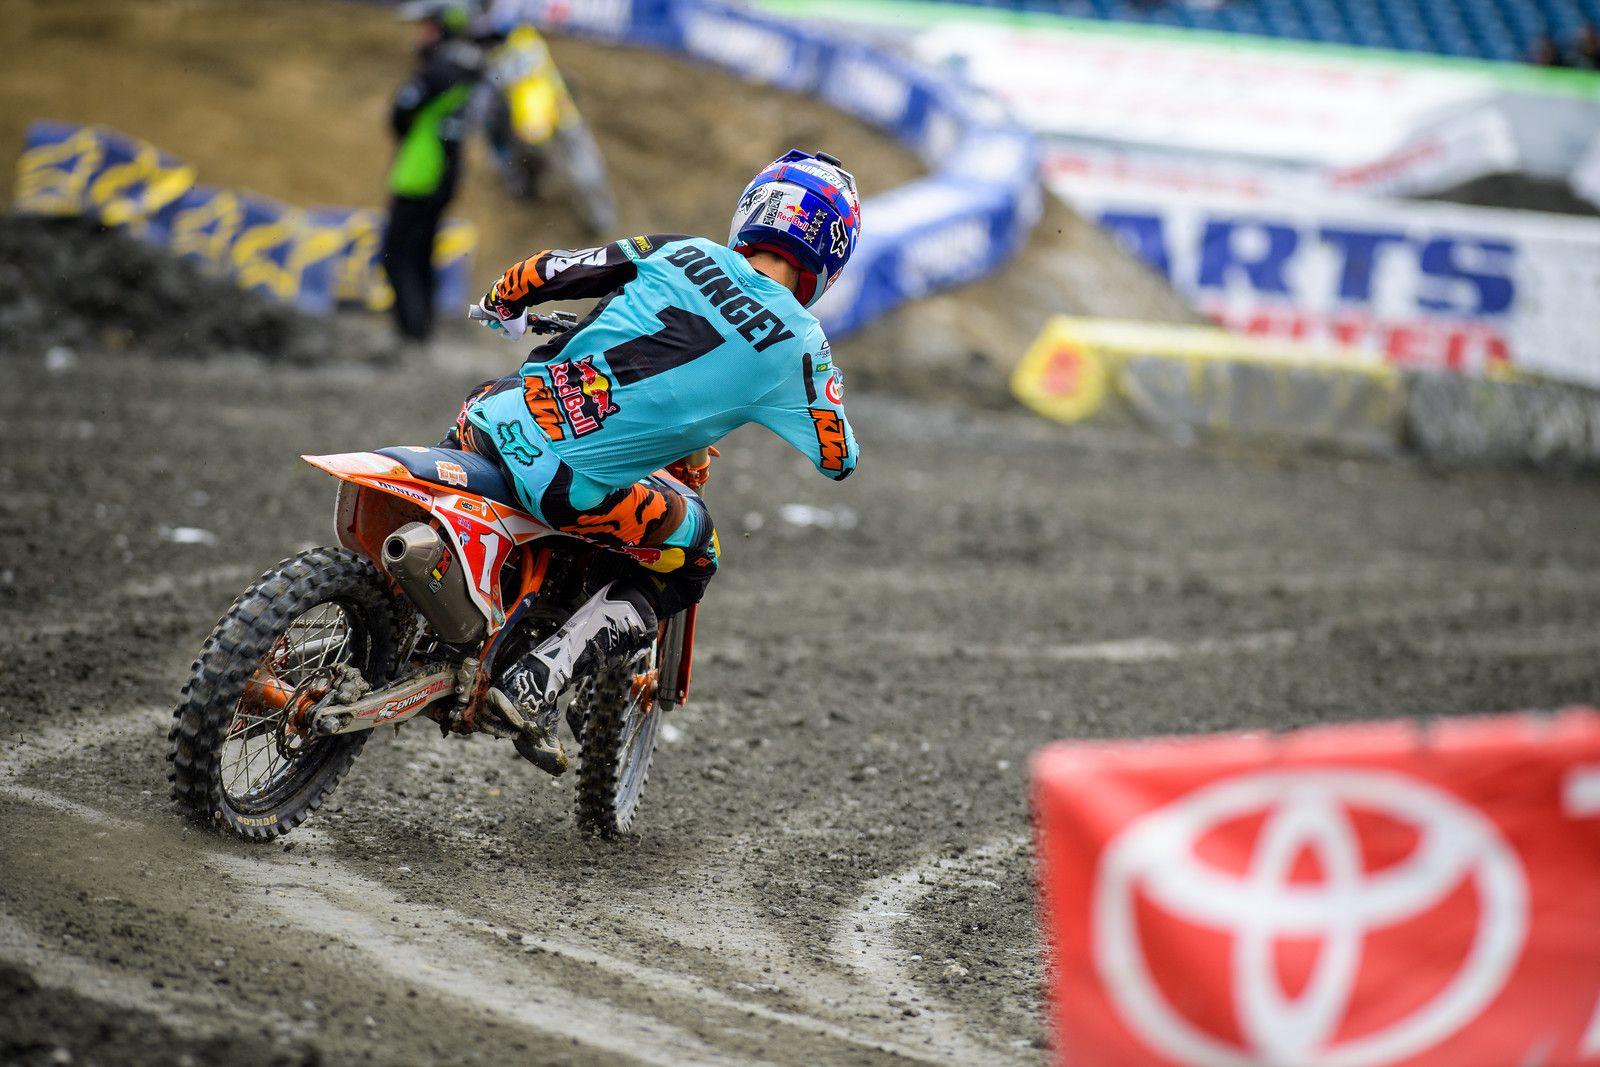 Ryan Dungey Foxborough Sx Dirt Bikes Motocross Motorcycle